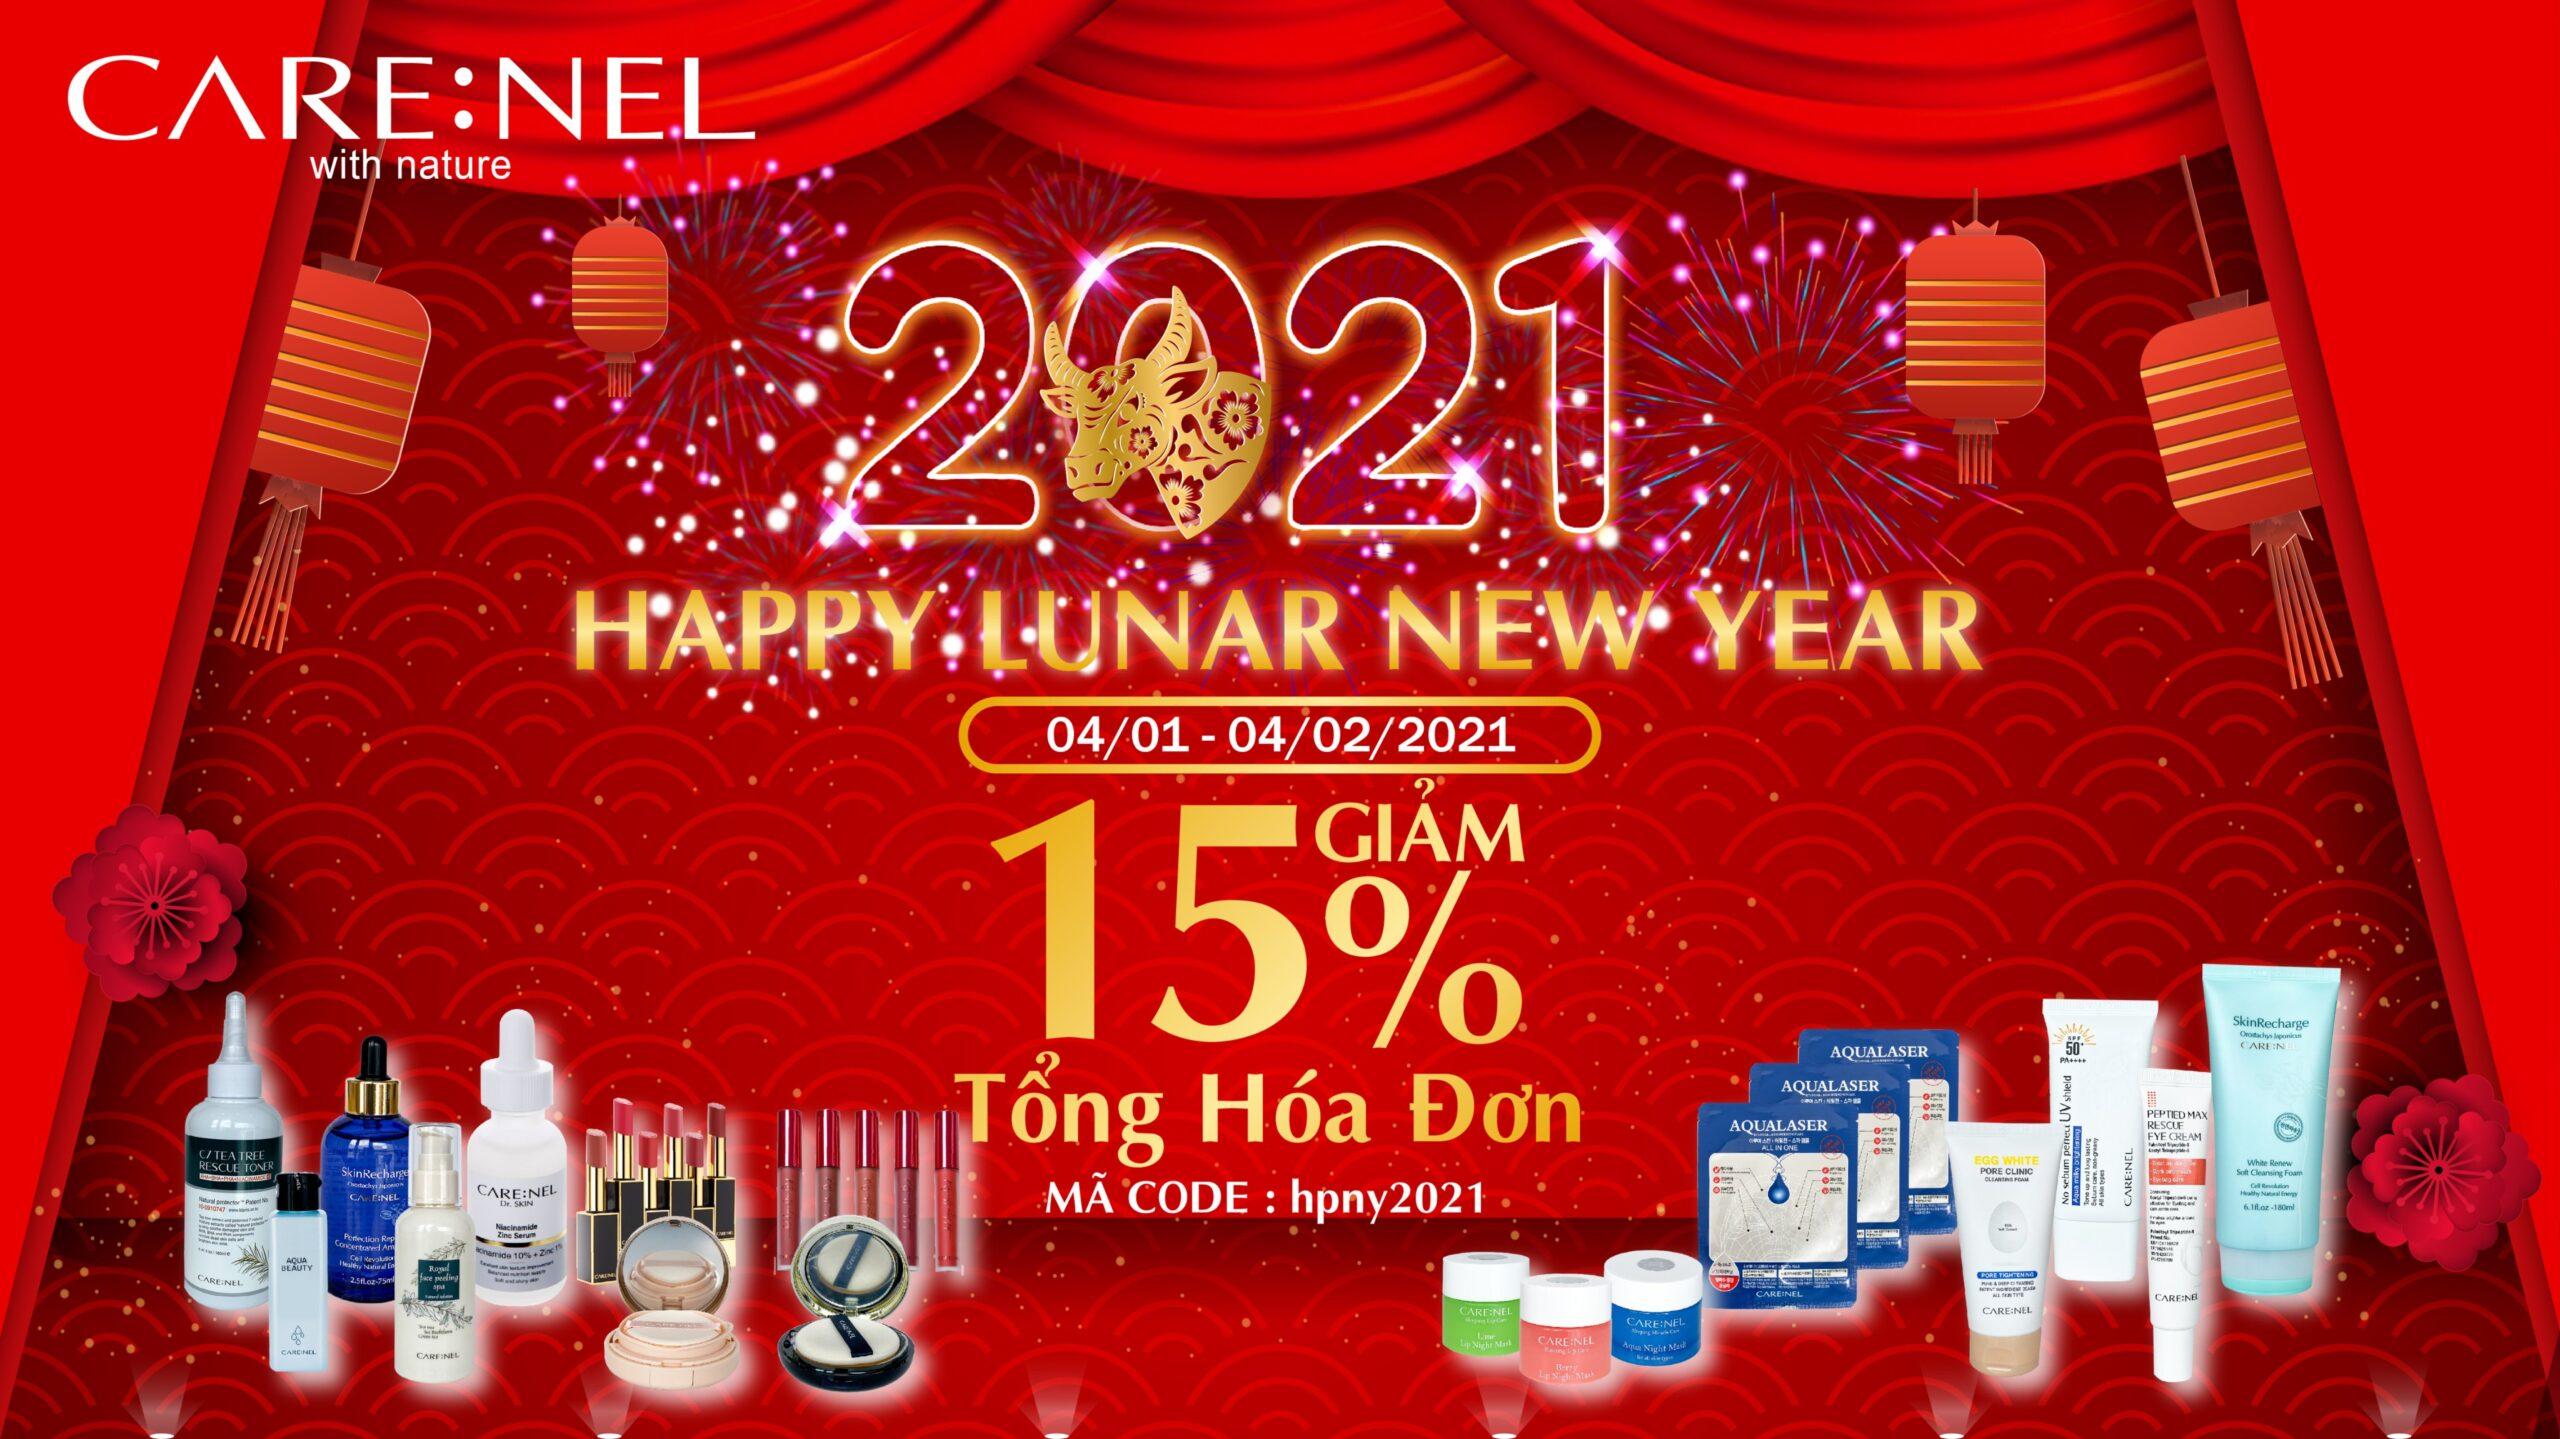 Chuong Trinh Uu Dai Hpny 2021 Carenel